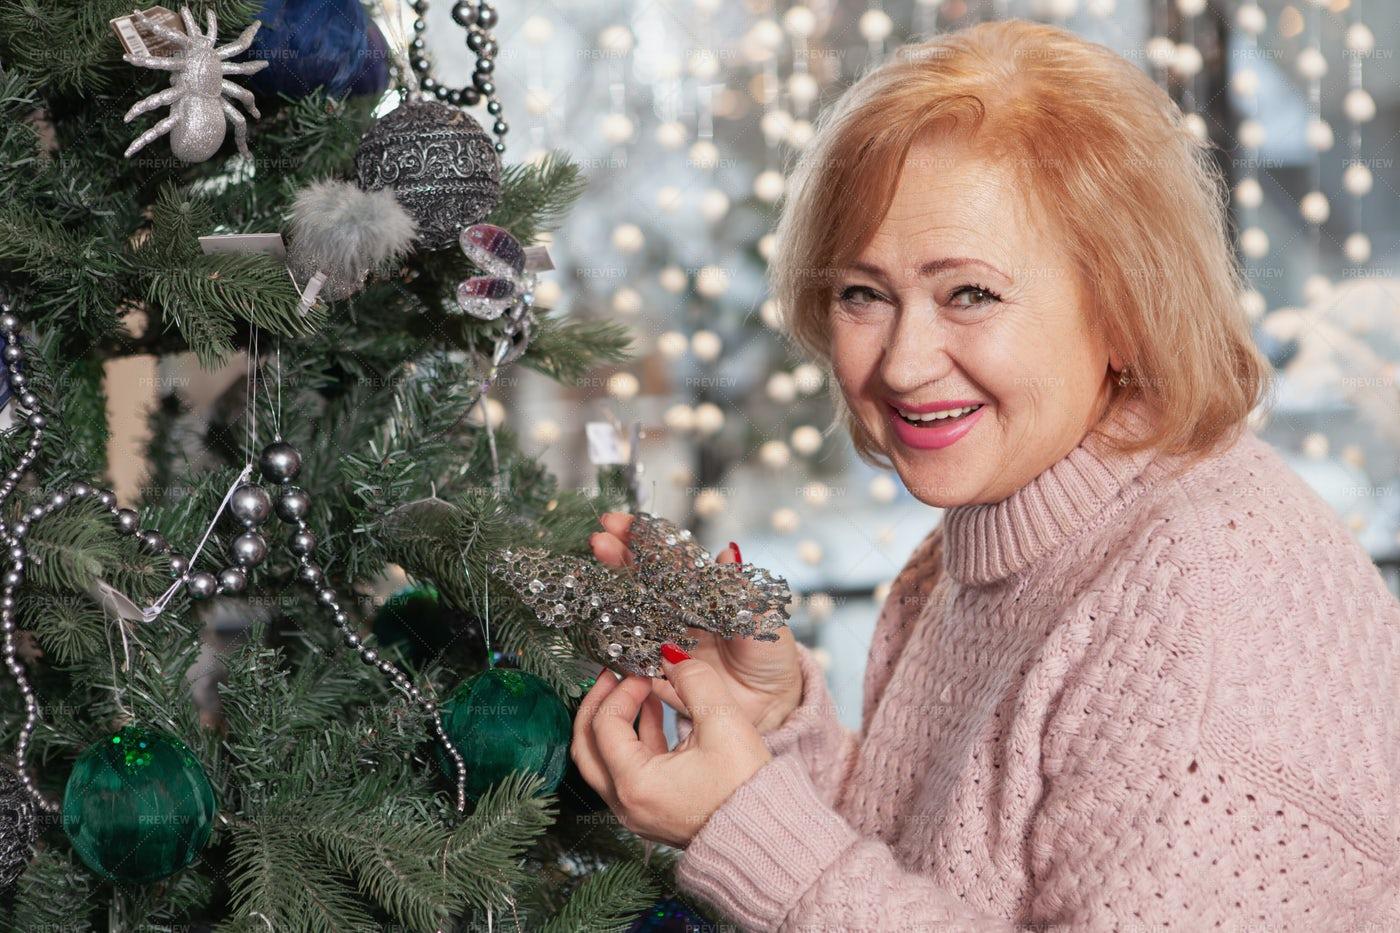 Granmother Beside The Tree: Stock Photos